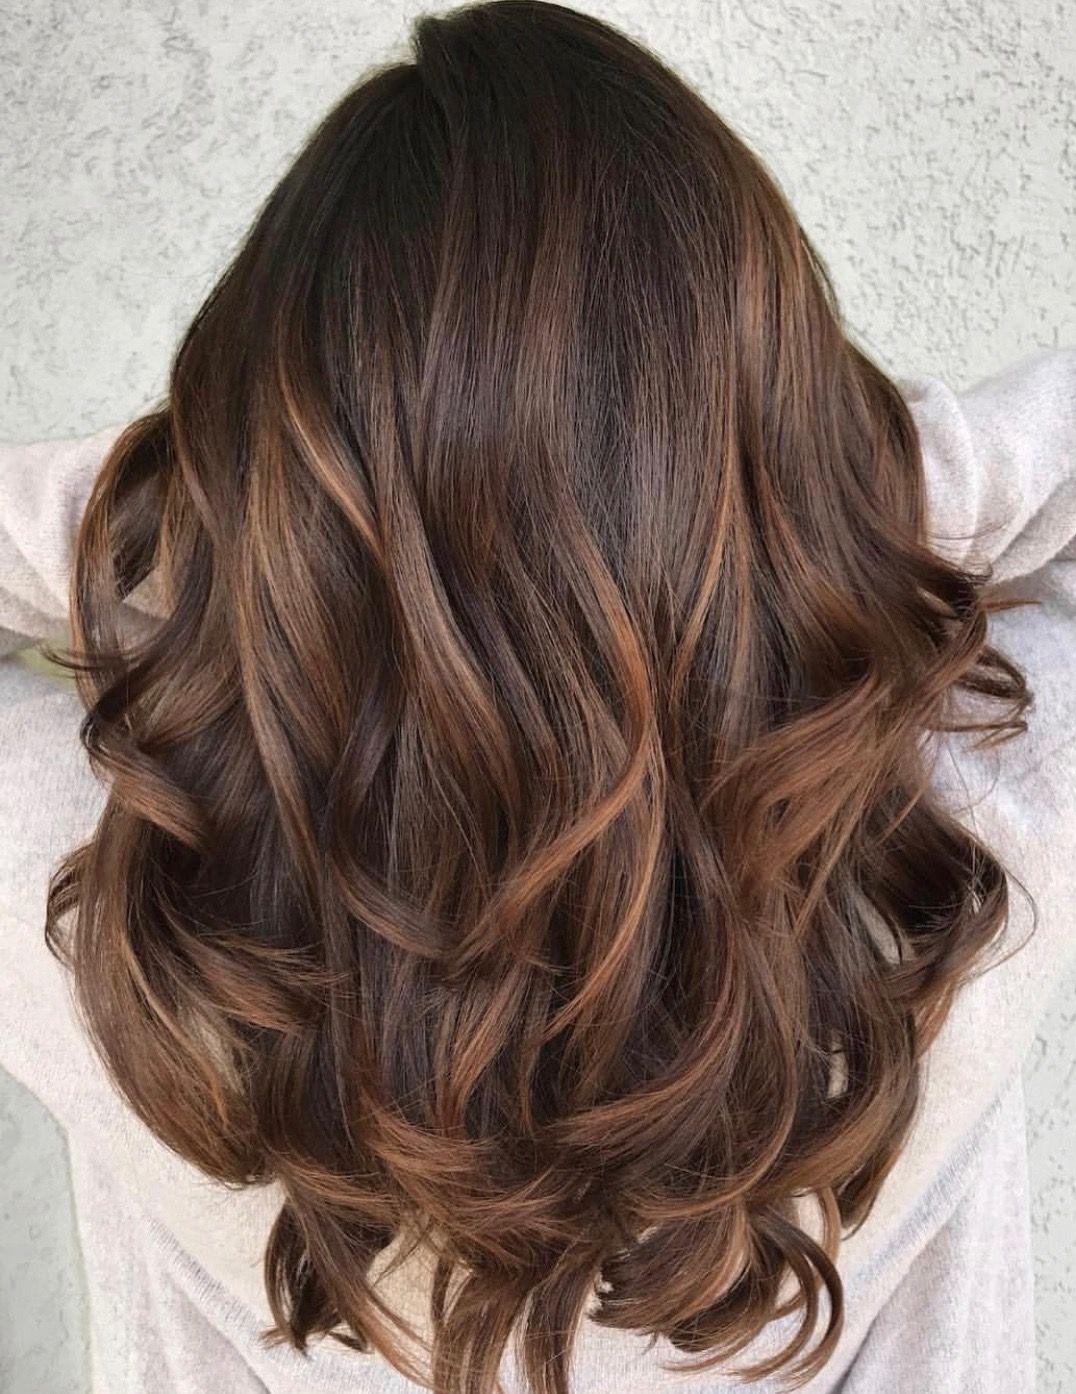 Pin De Golsa Em Hairstyles Cabelo Morenas Ideias De Cabelo Cabelo